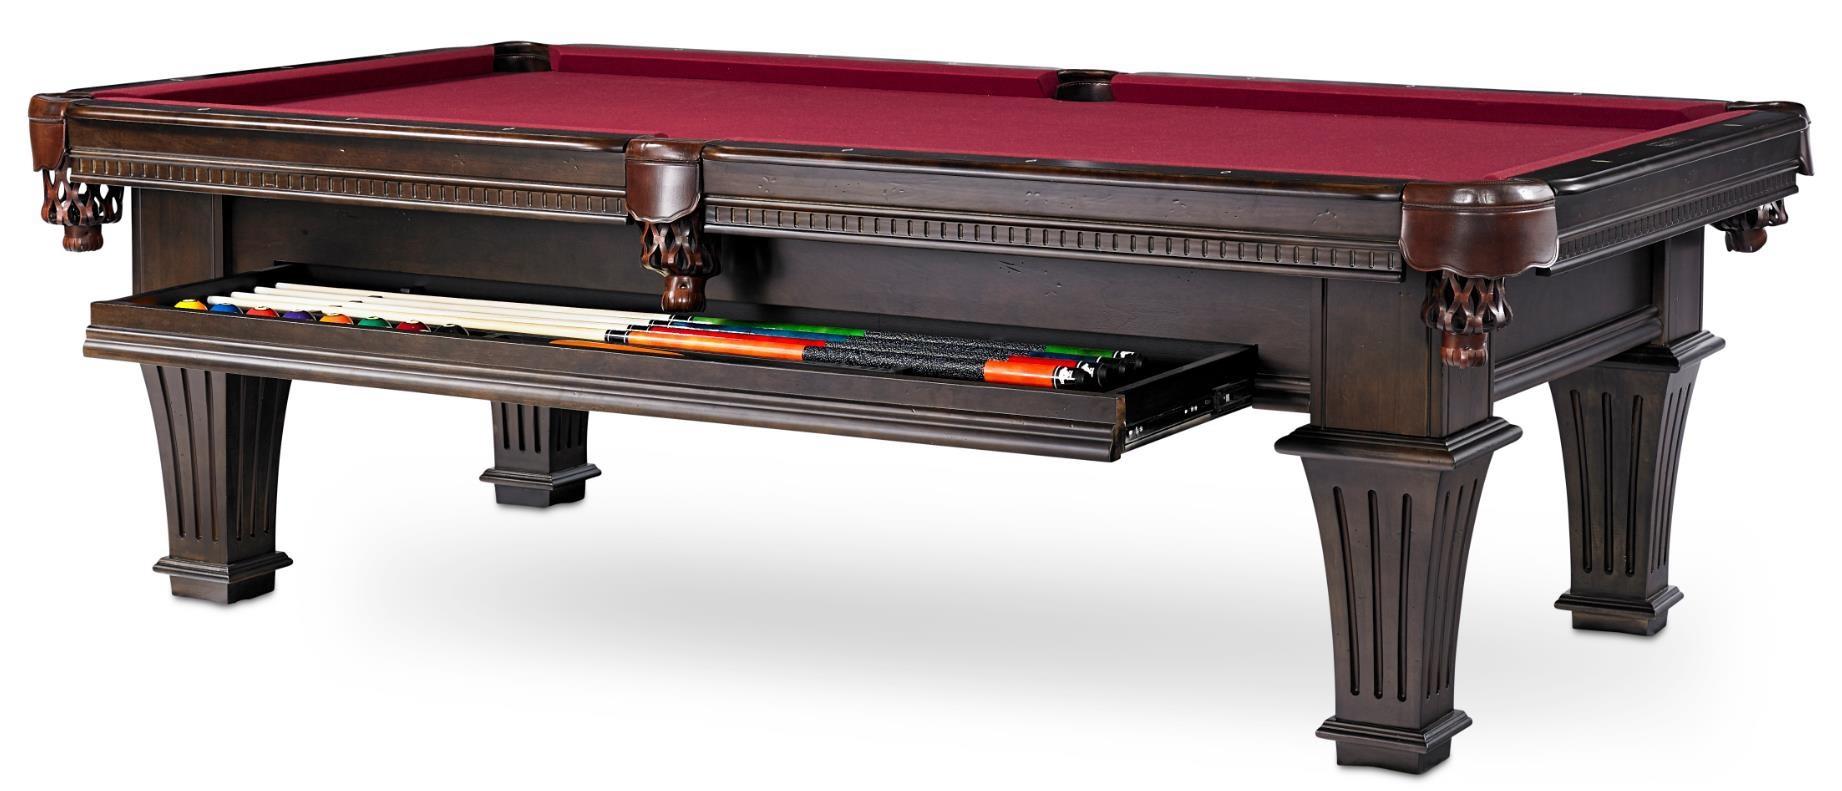 Talbot pool table.jpg